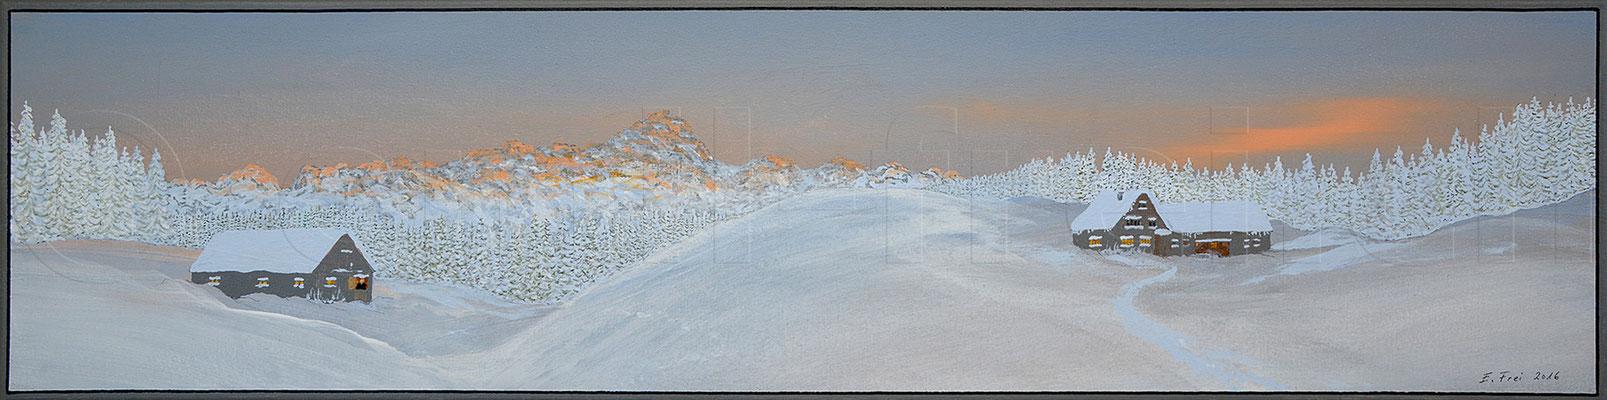 20 x 80 cm, Acryl auf Leinwand, 2016